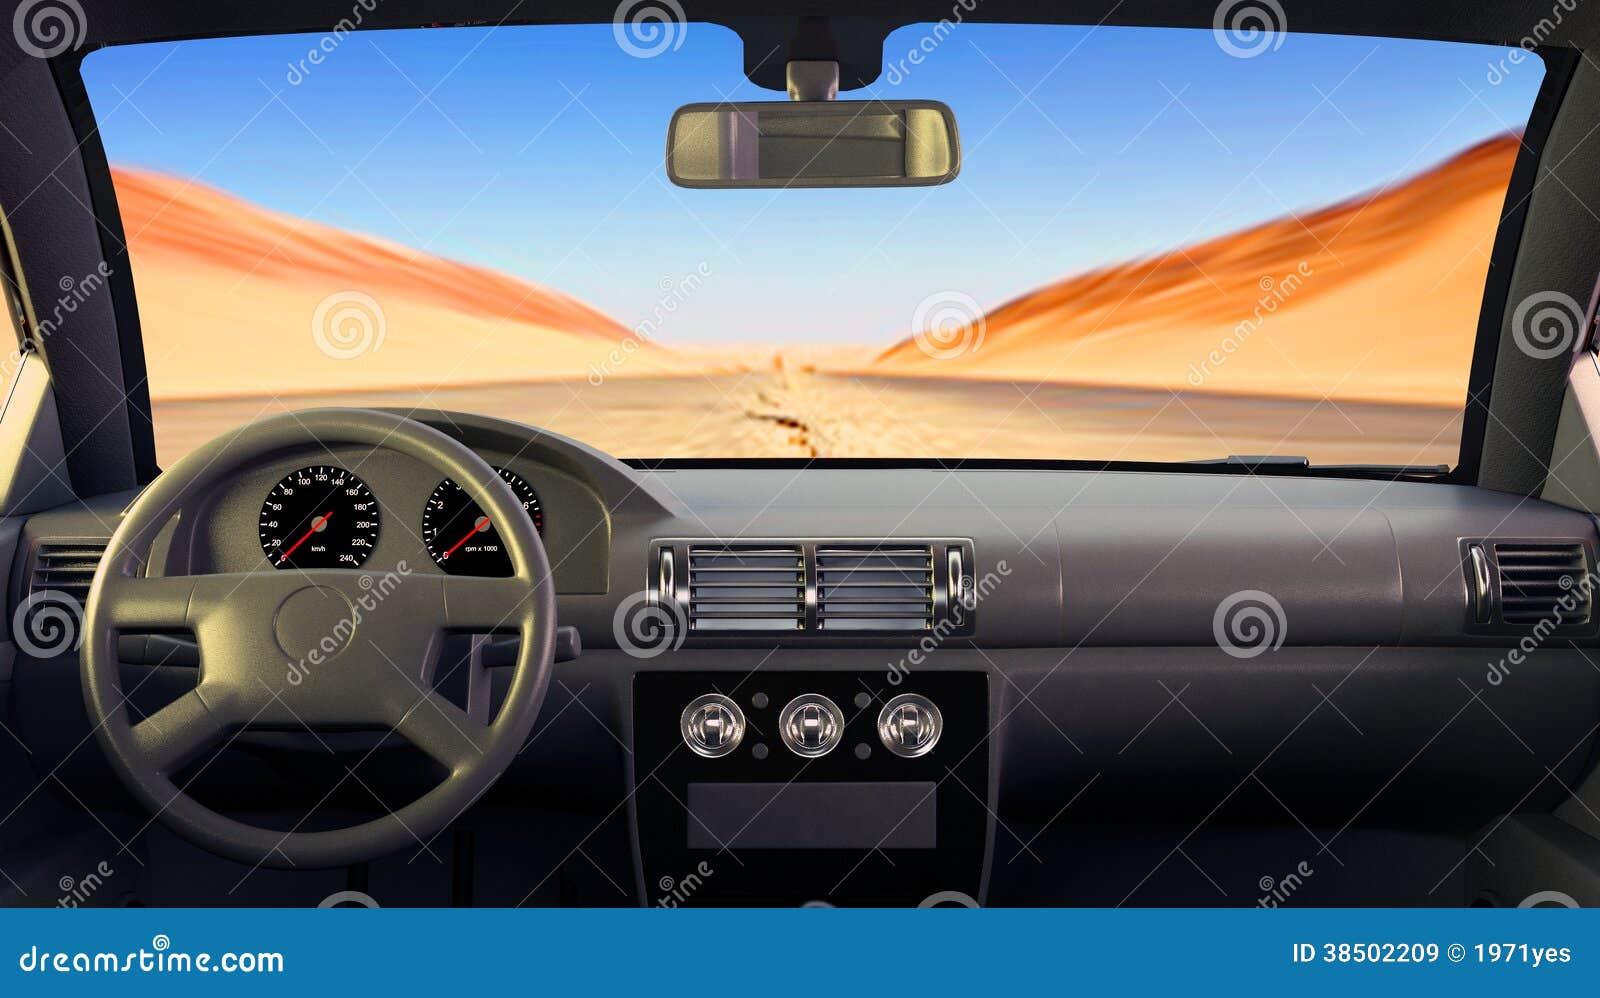 the car inside royalty free stock images image 38502209. Black Bedroom Furniture Sets. Home Design Ideas